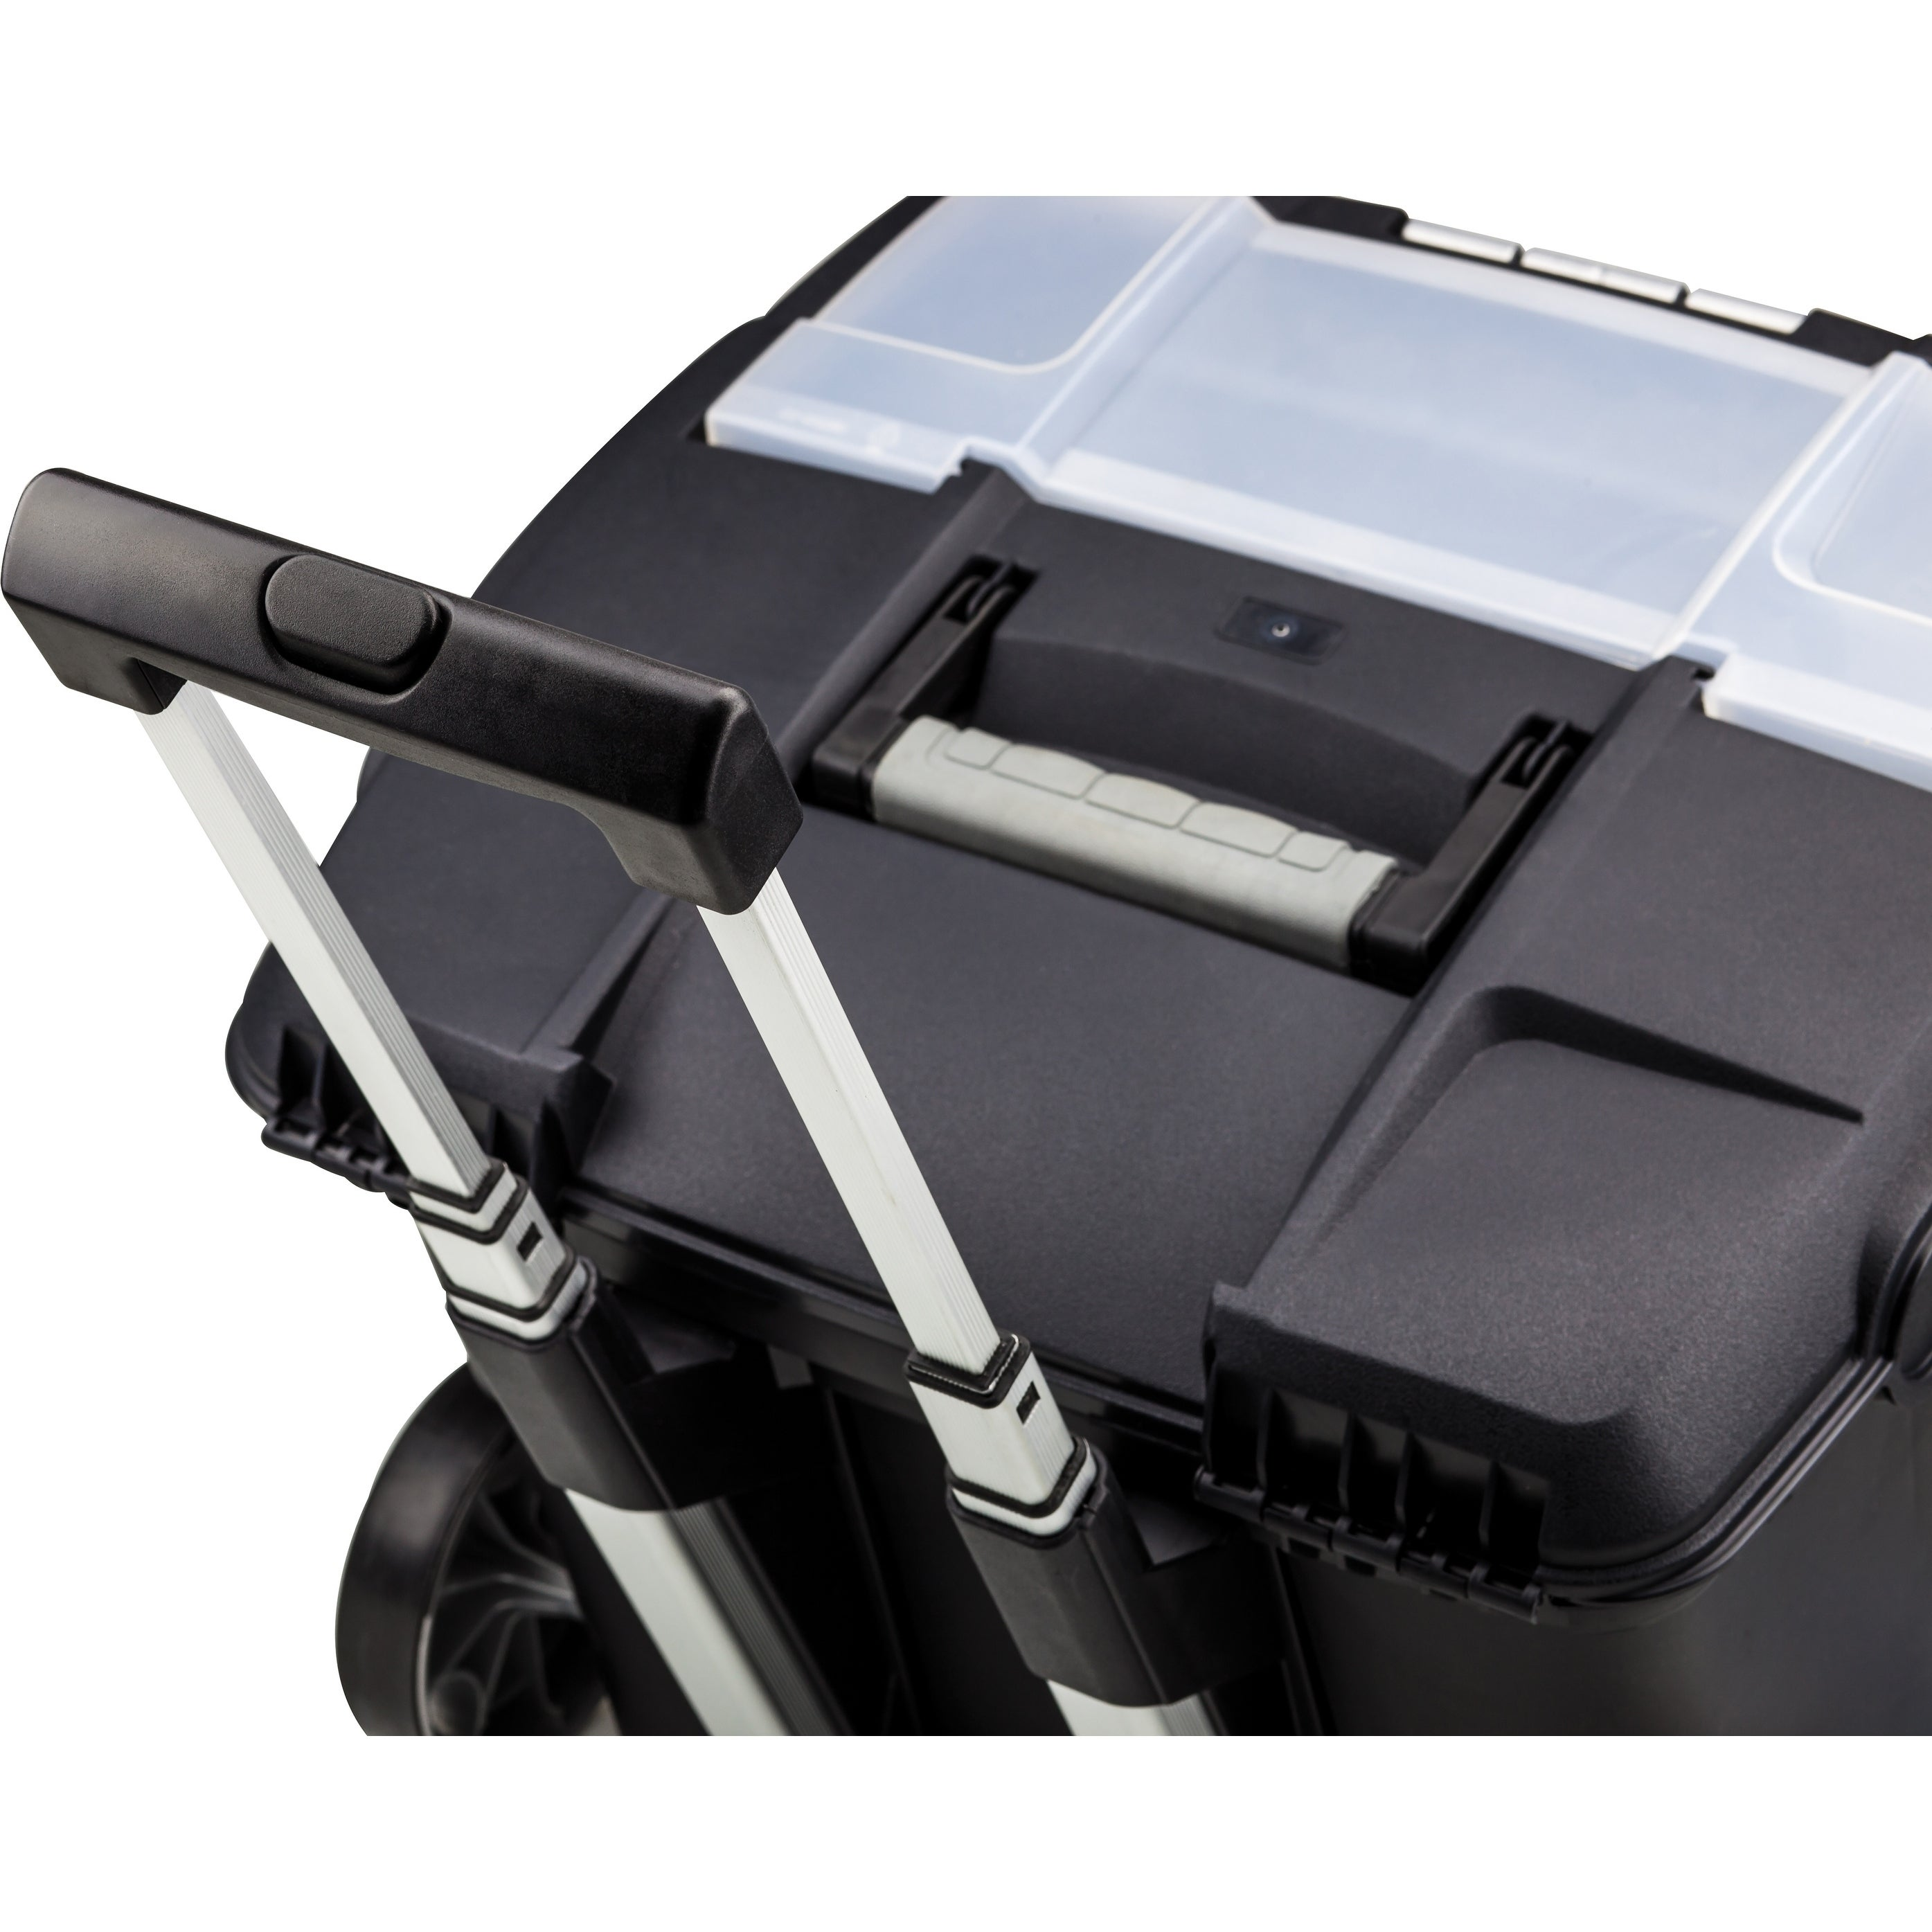 Shop Storex Premium Portable File Box On Wheels Free Shipping